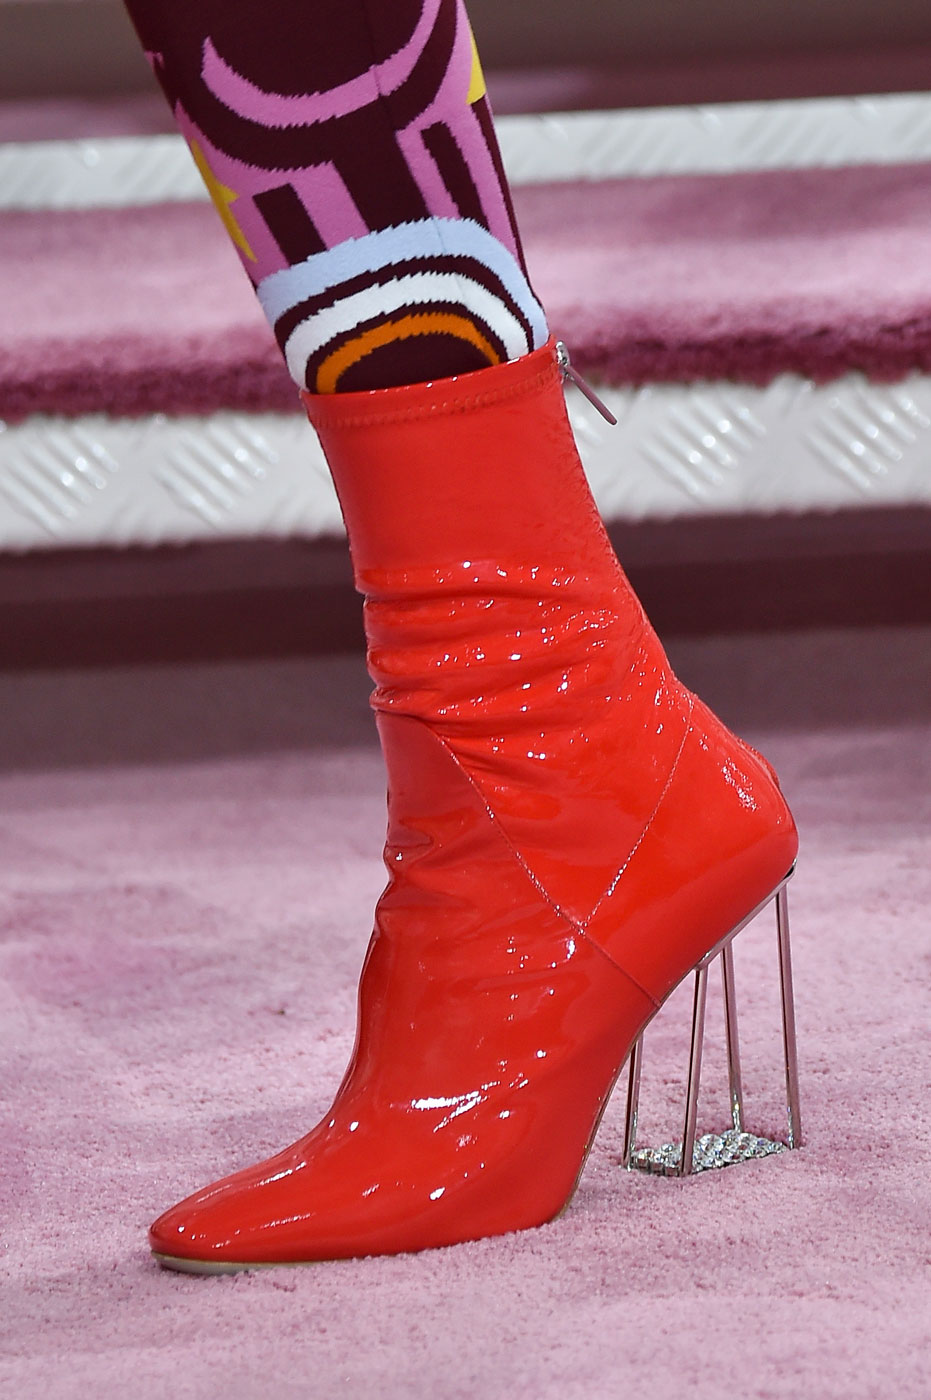 Christian-Dior-fashion-runway-show-close-ups-haute-couture-paris-spring-summer-2015-the-impression-013